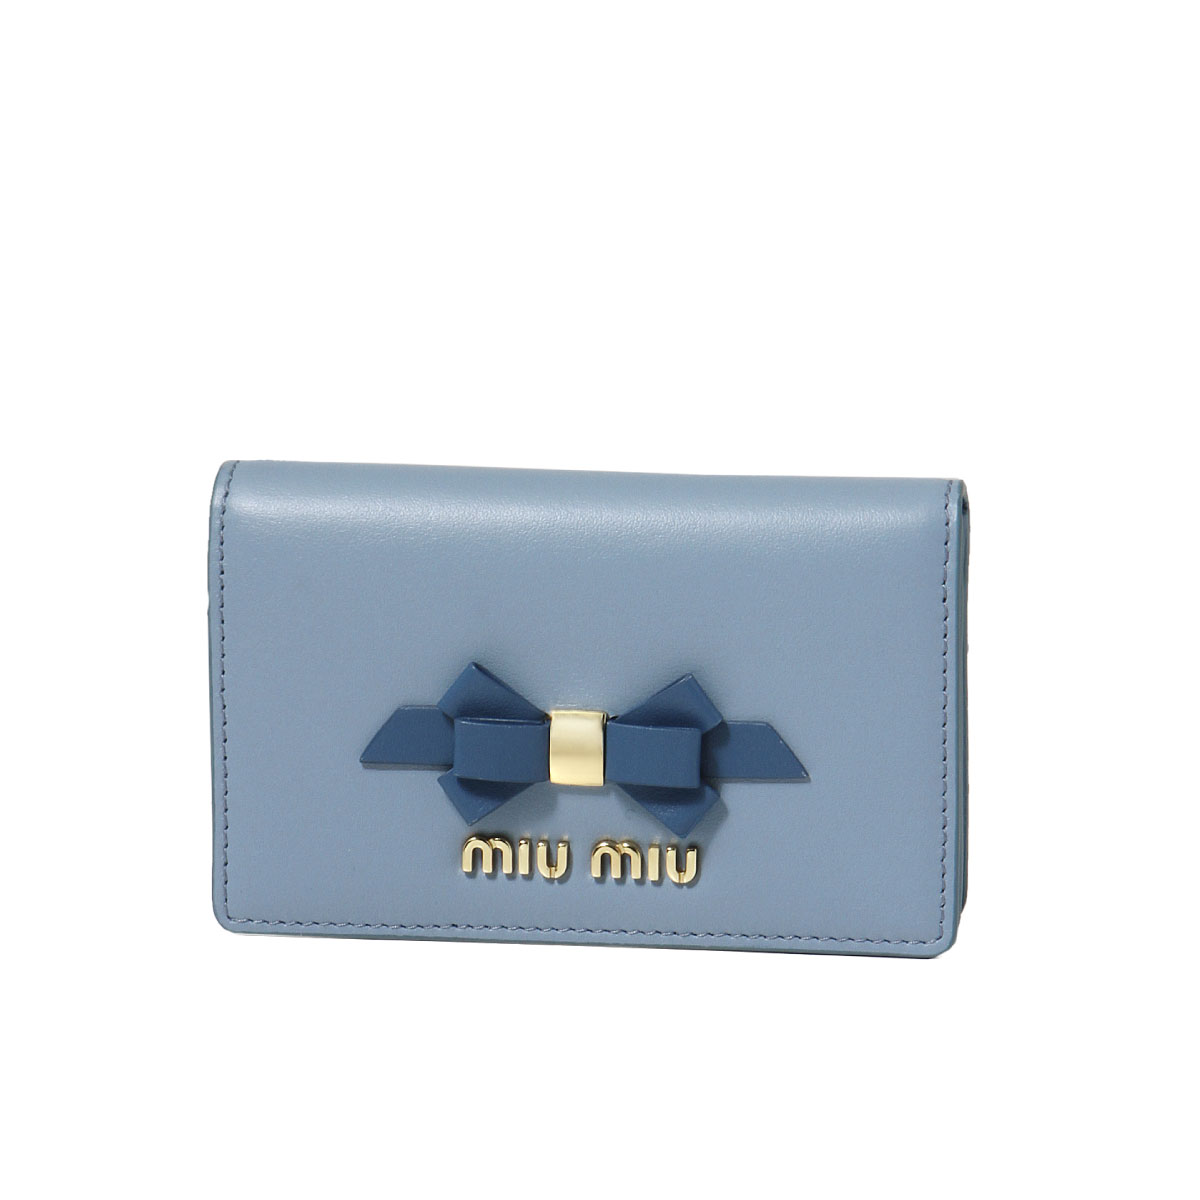 9ced50bdba22 楽天市場】ミュウ ミュウ MIU MIU カードケース レディース 5MC011 2B61 ...